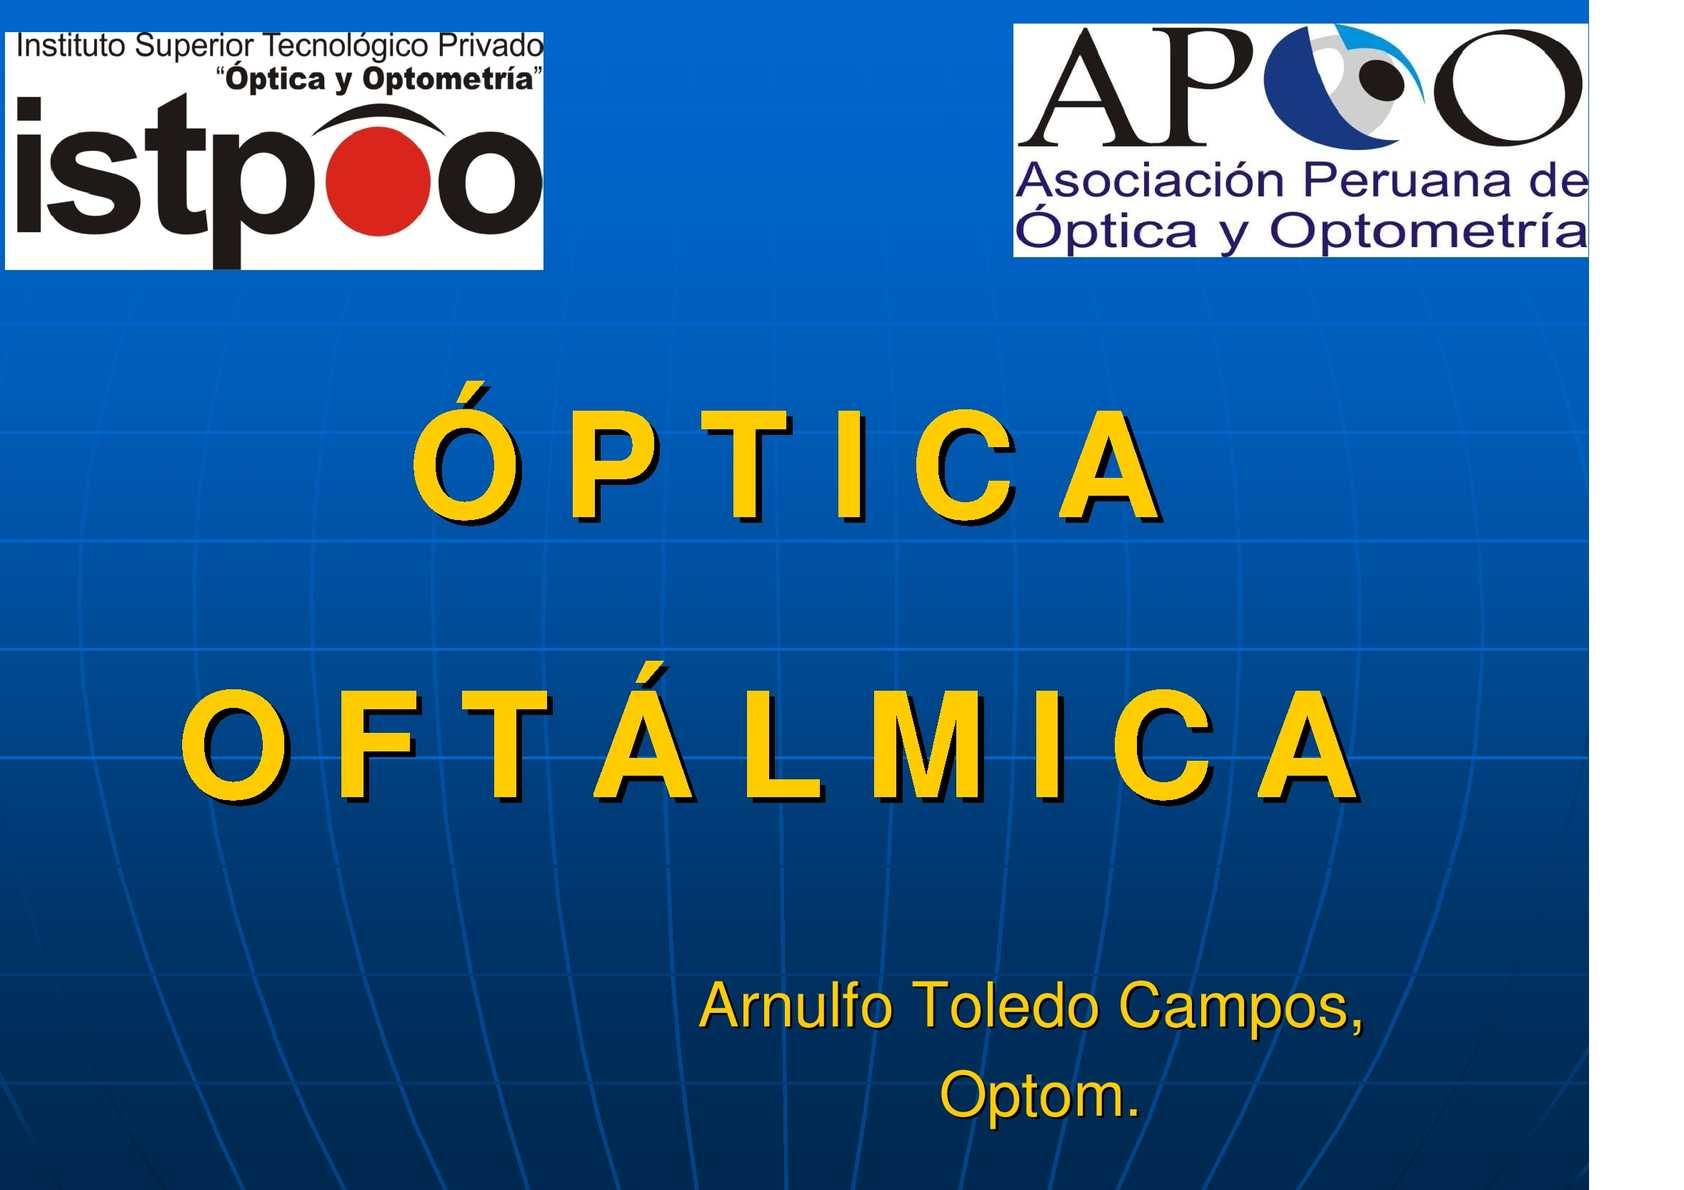 af3fc07ae1120 Calaméo - Óptica Oftalmica  Arnulfo Toledo Campos, Optom